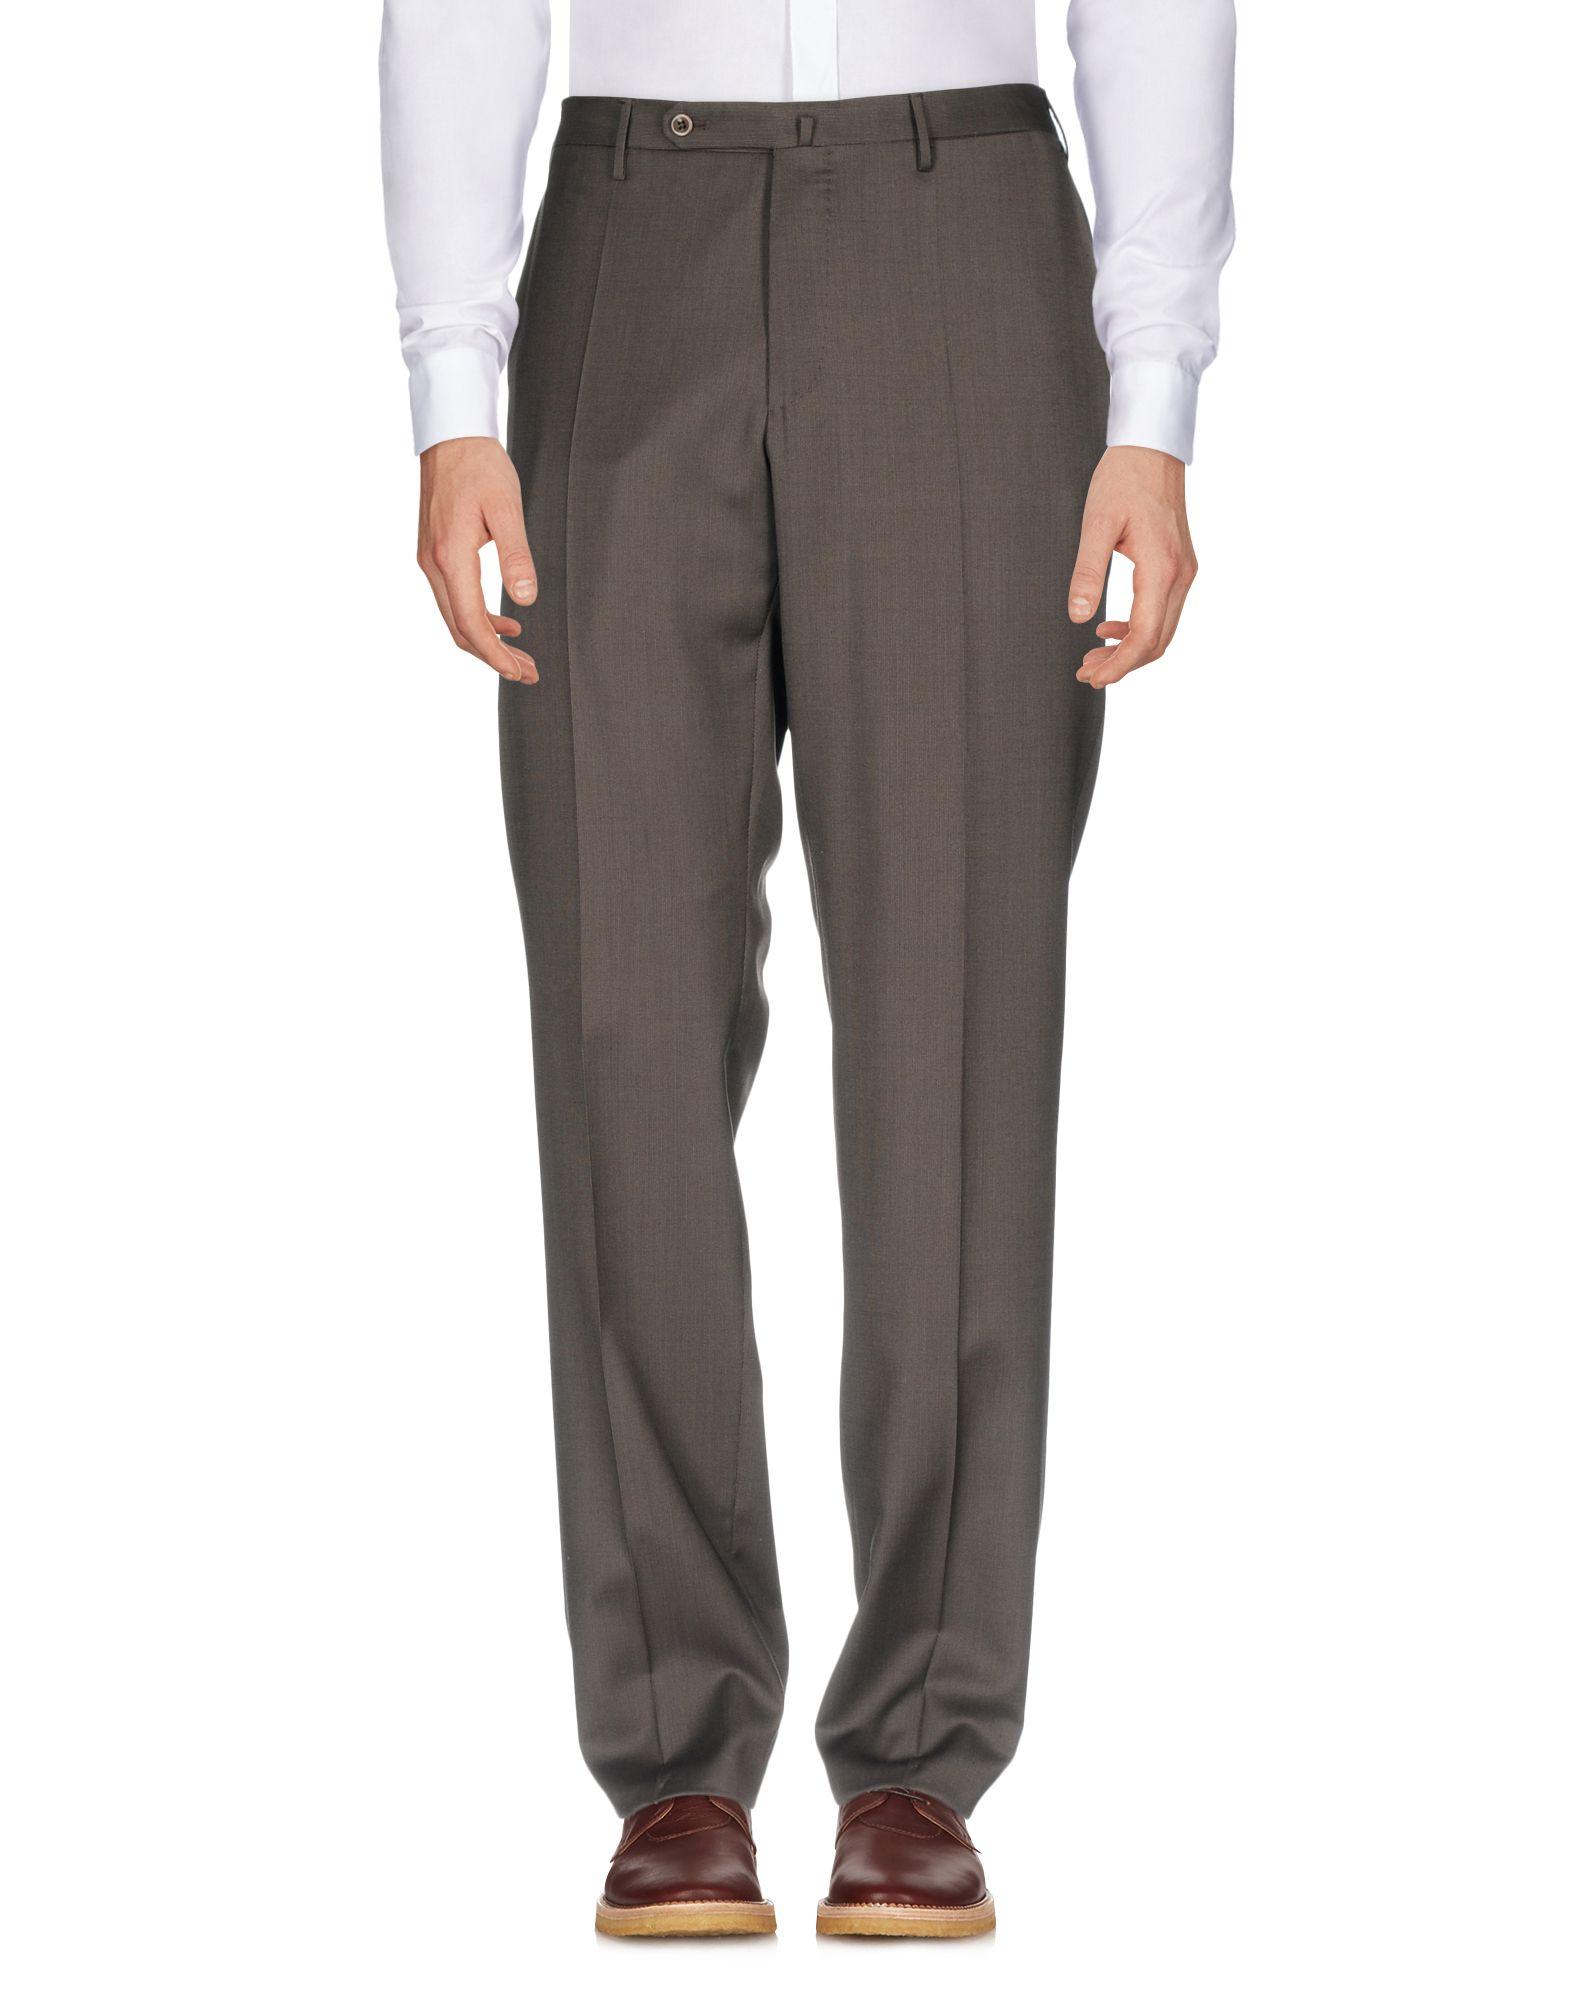 A A A buon mercato Pantalone Incotex Uomo - 13144179GO 801e32